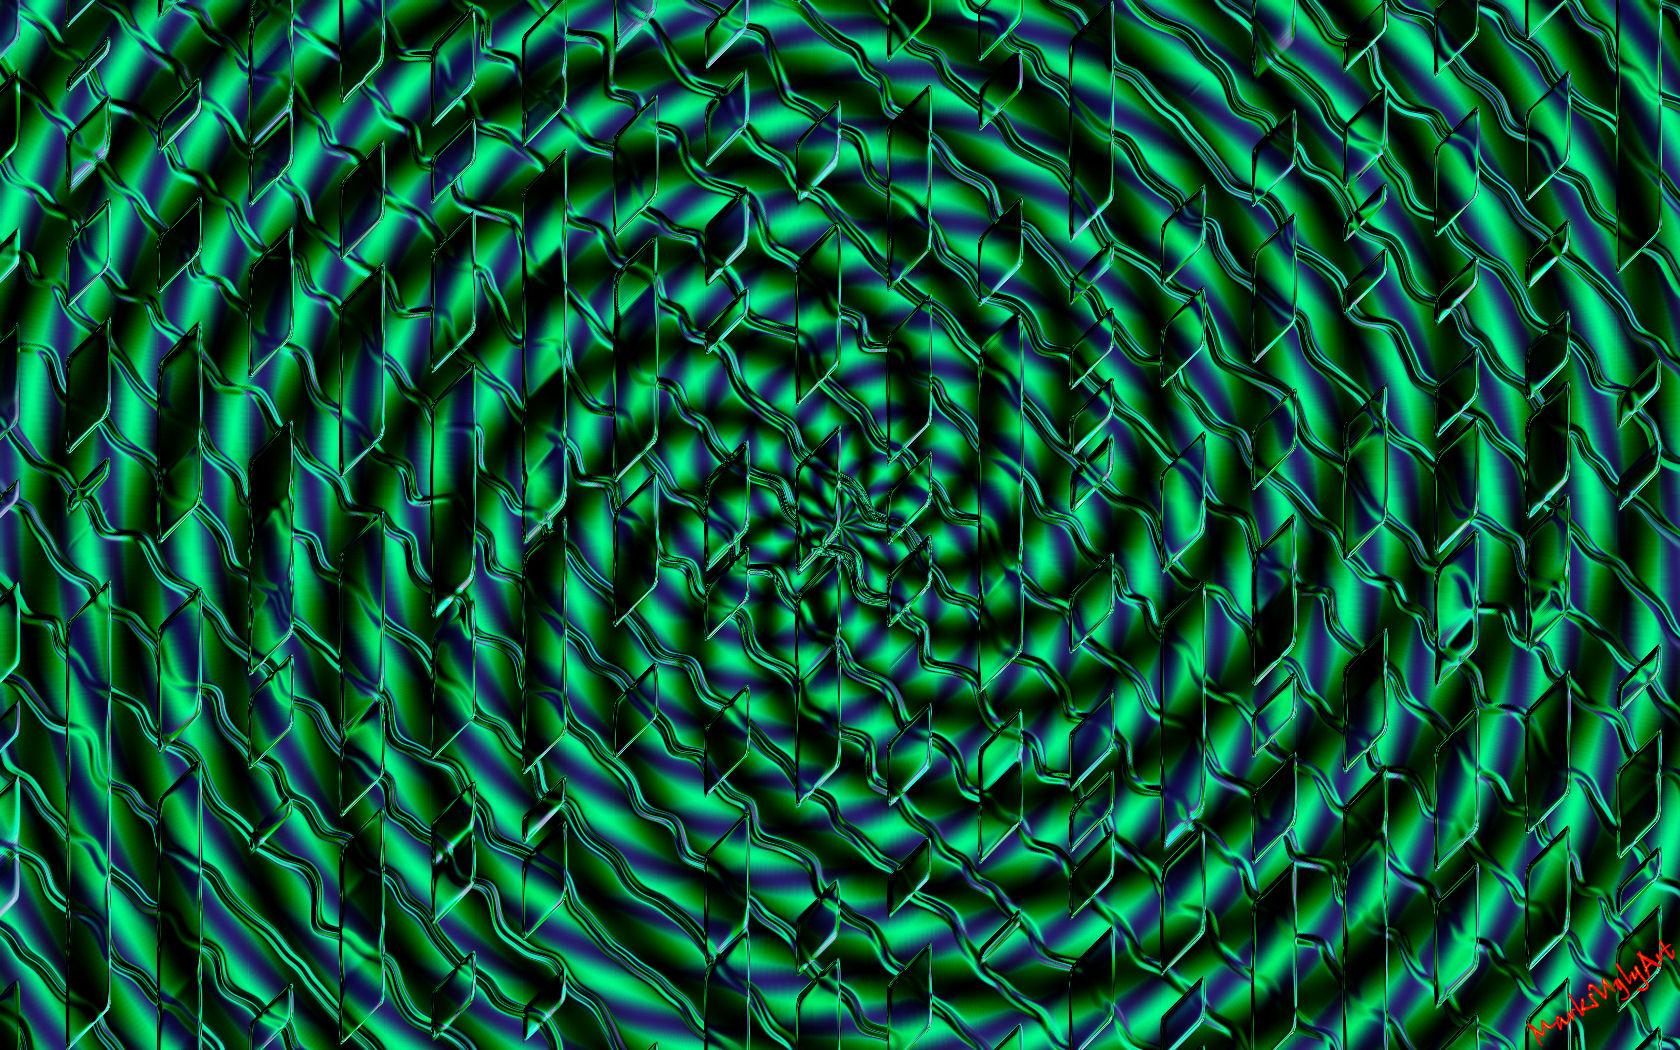 Trippy Wallpaper 1680x1050 Trippy 1680x1050